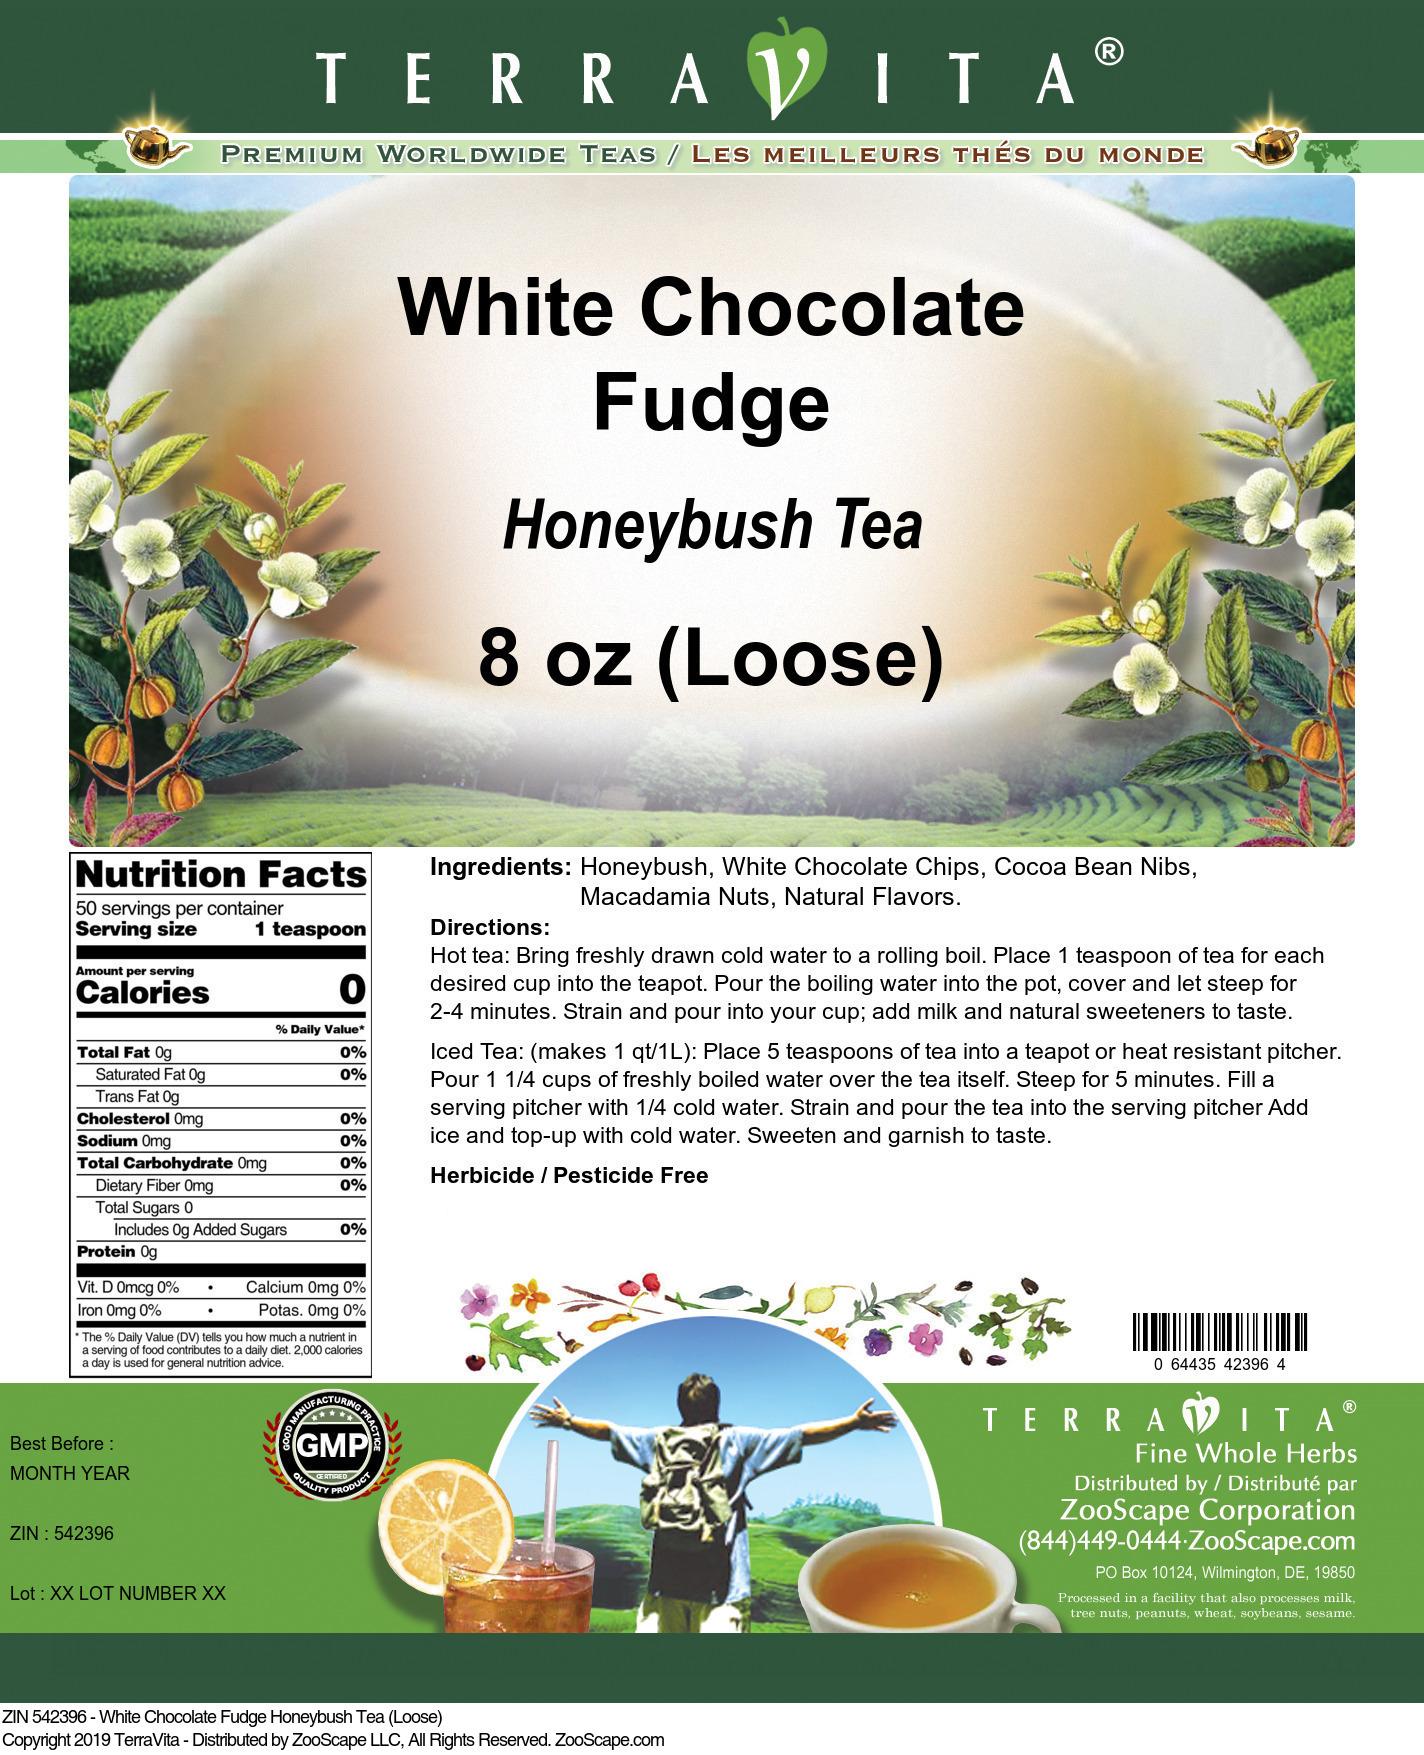 White Chocolate Fudge Honeybush Tea (Loose)